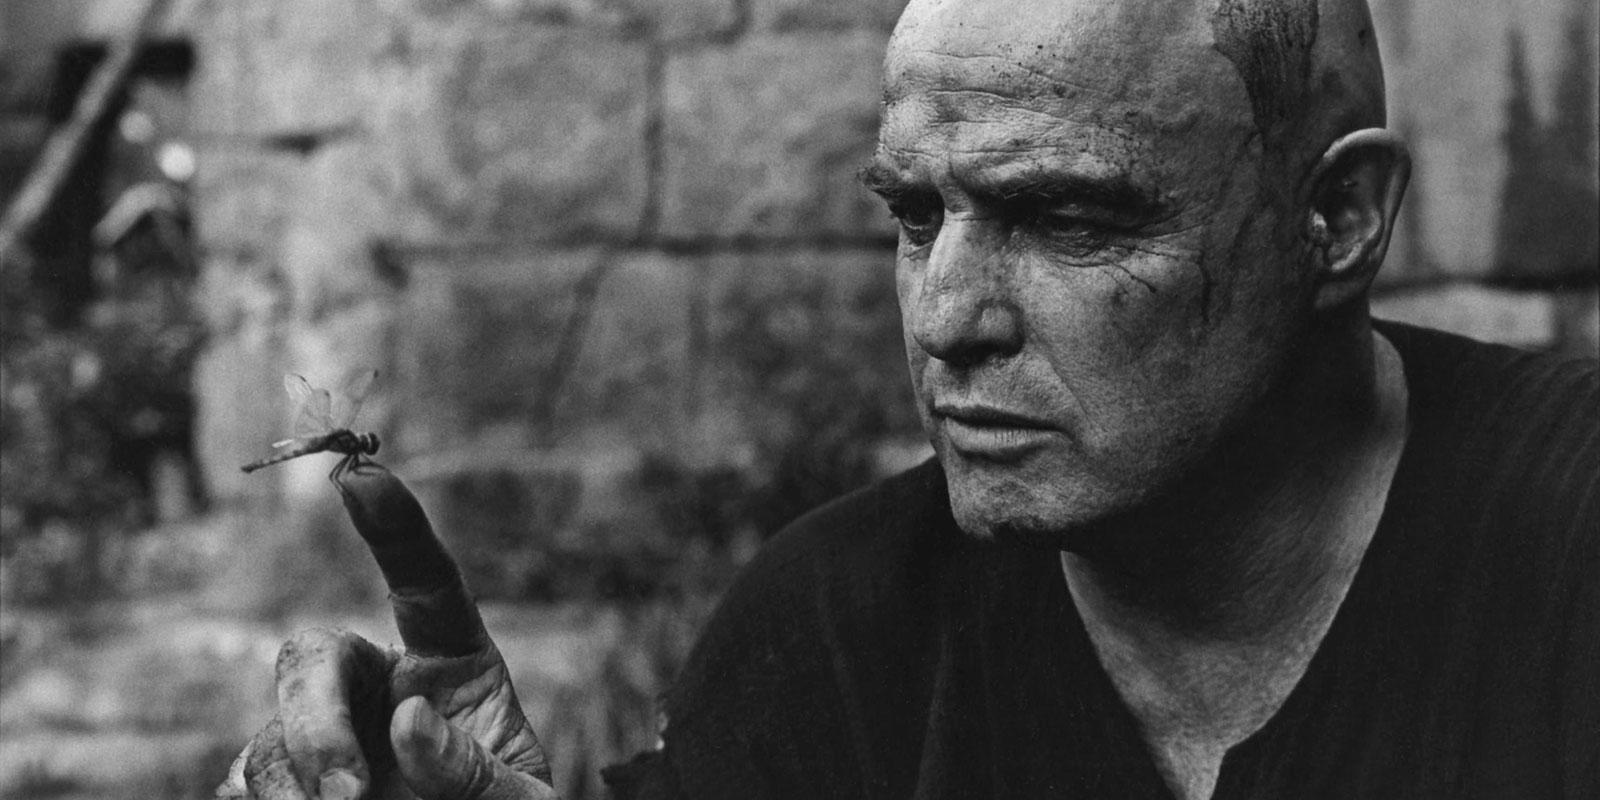 Марлон Брандо на съёмках фильма Апокалипсис сегодня (Apocalypse Now) 1979